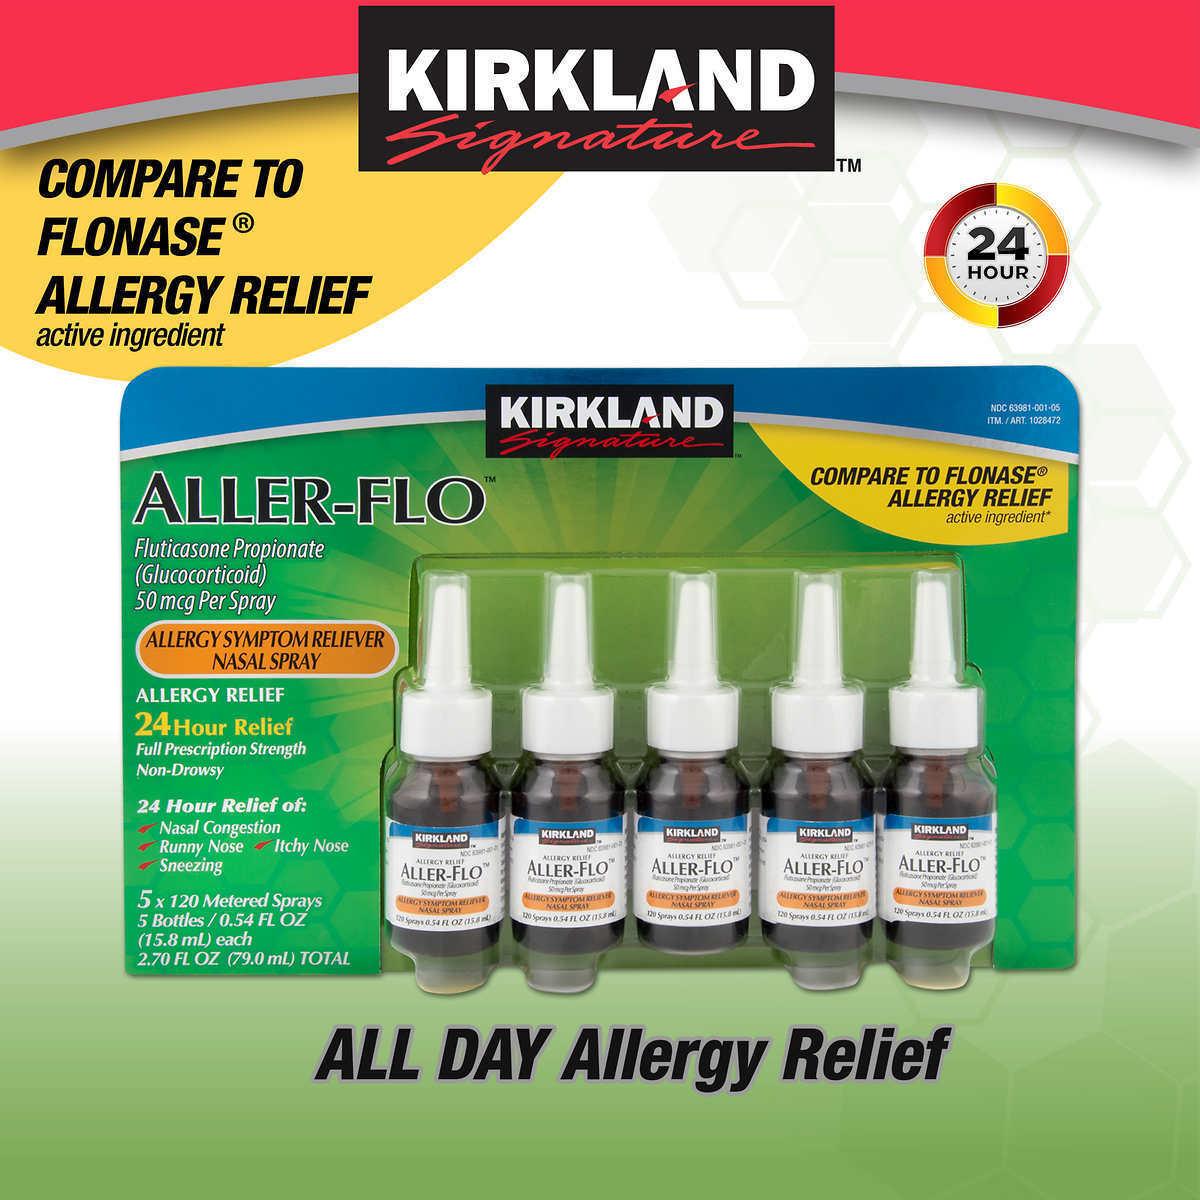 Kirkland Signature Aller-flo, 600 Sprays - 5 Bottles, 120...